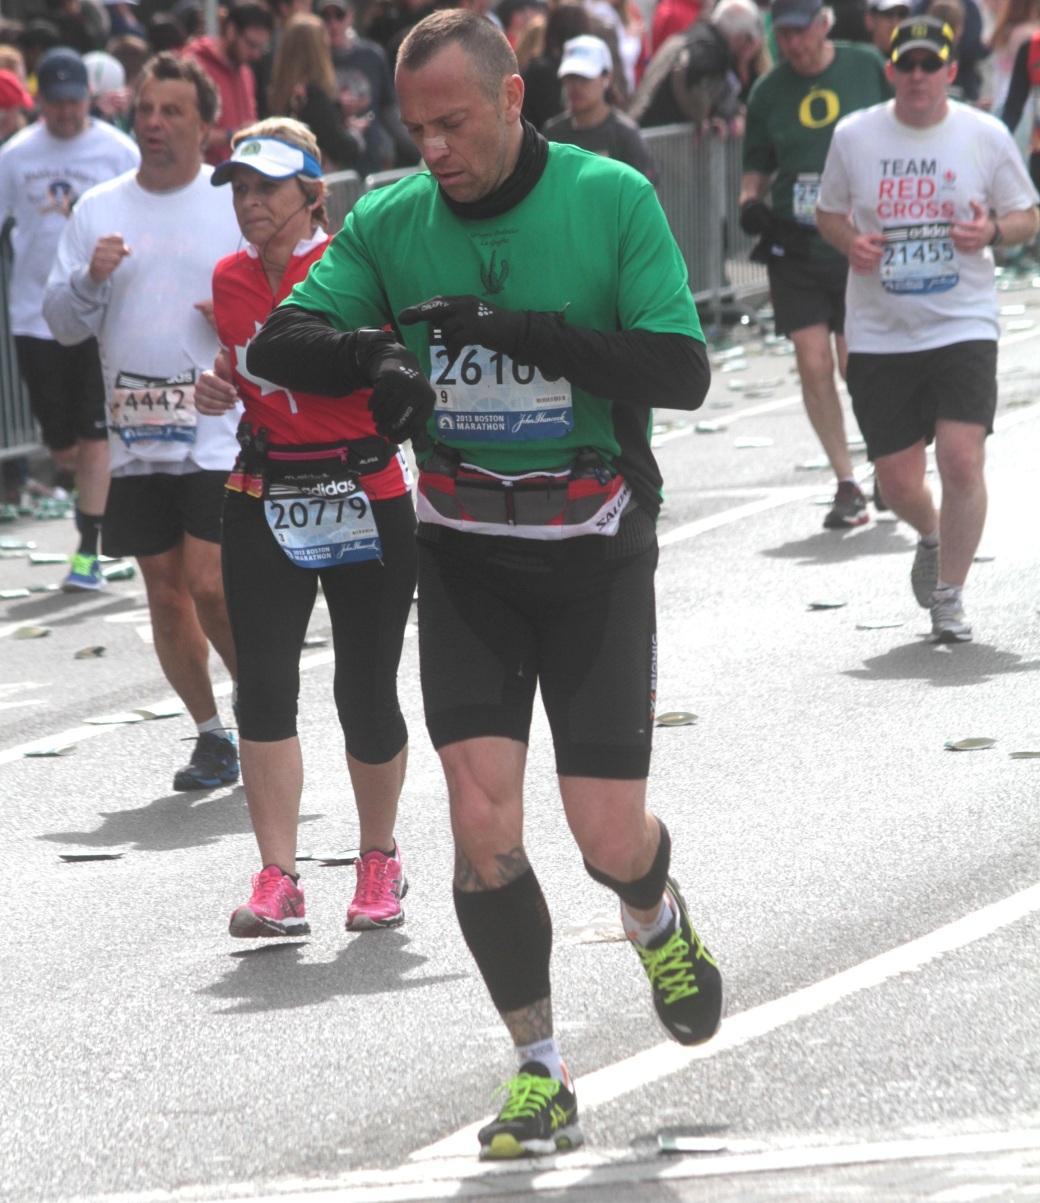 boston marathon 2013 number 20779